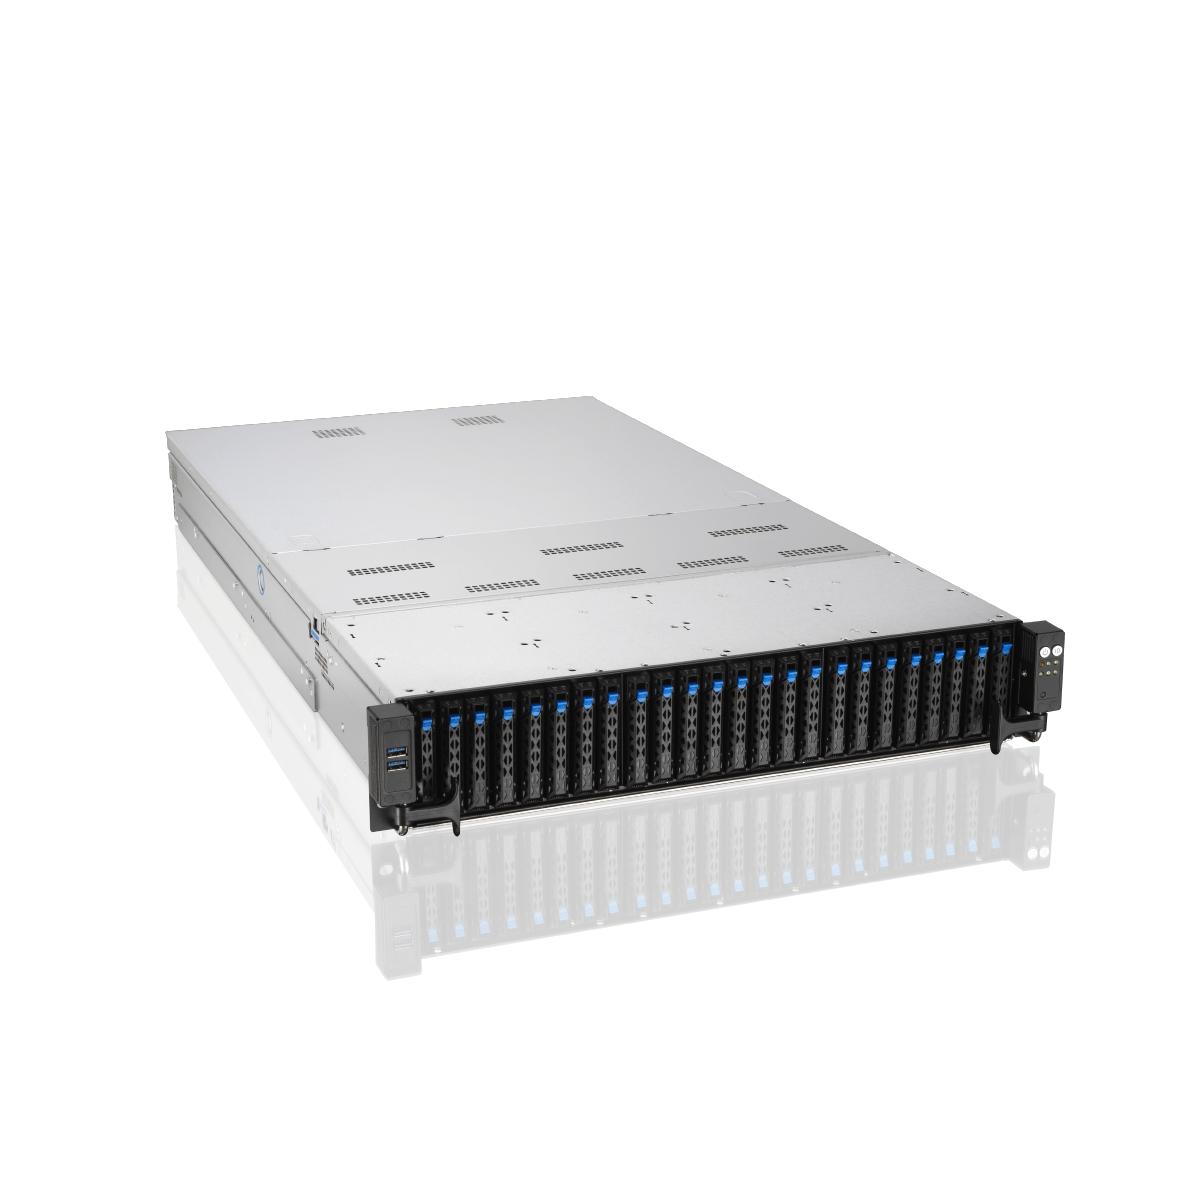 ASUS Server - RS720A